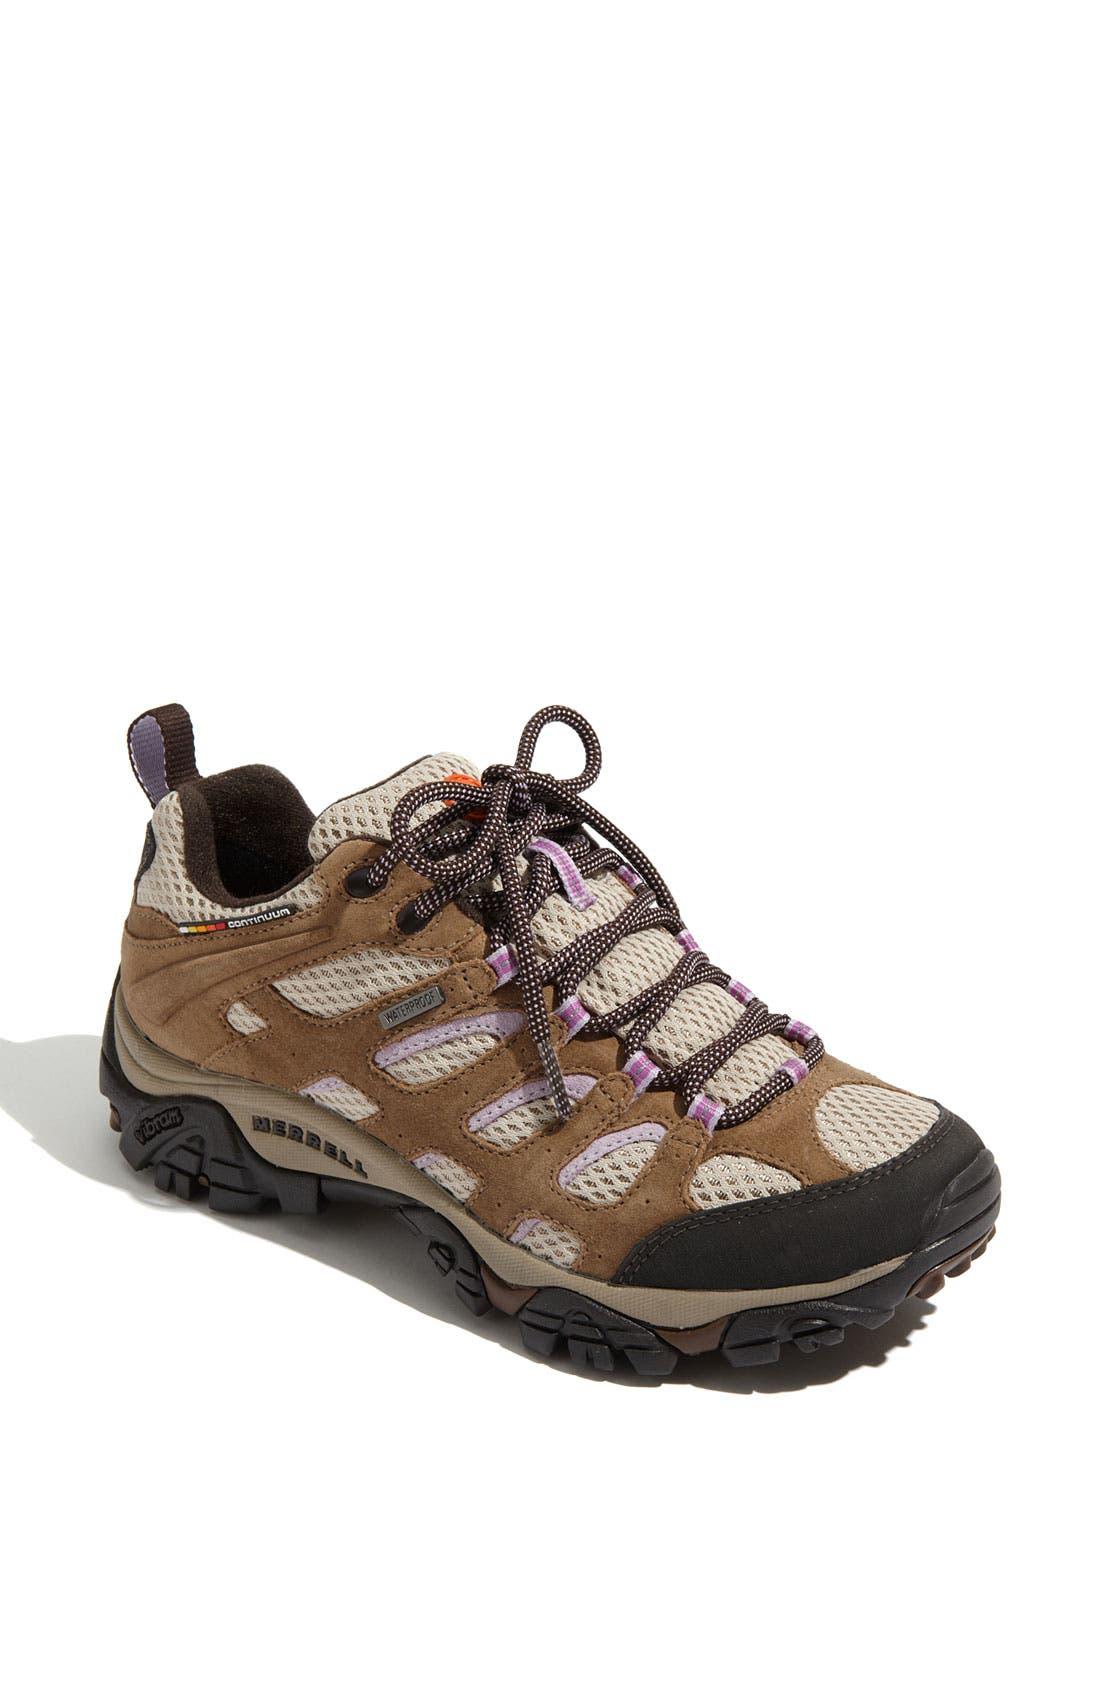 Alternate Image 1 Selected - Merrell 'Moab Waterproof' Trail Shoe (Women)